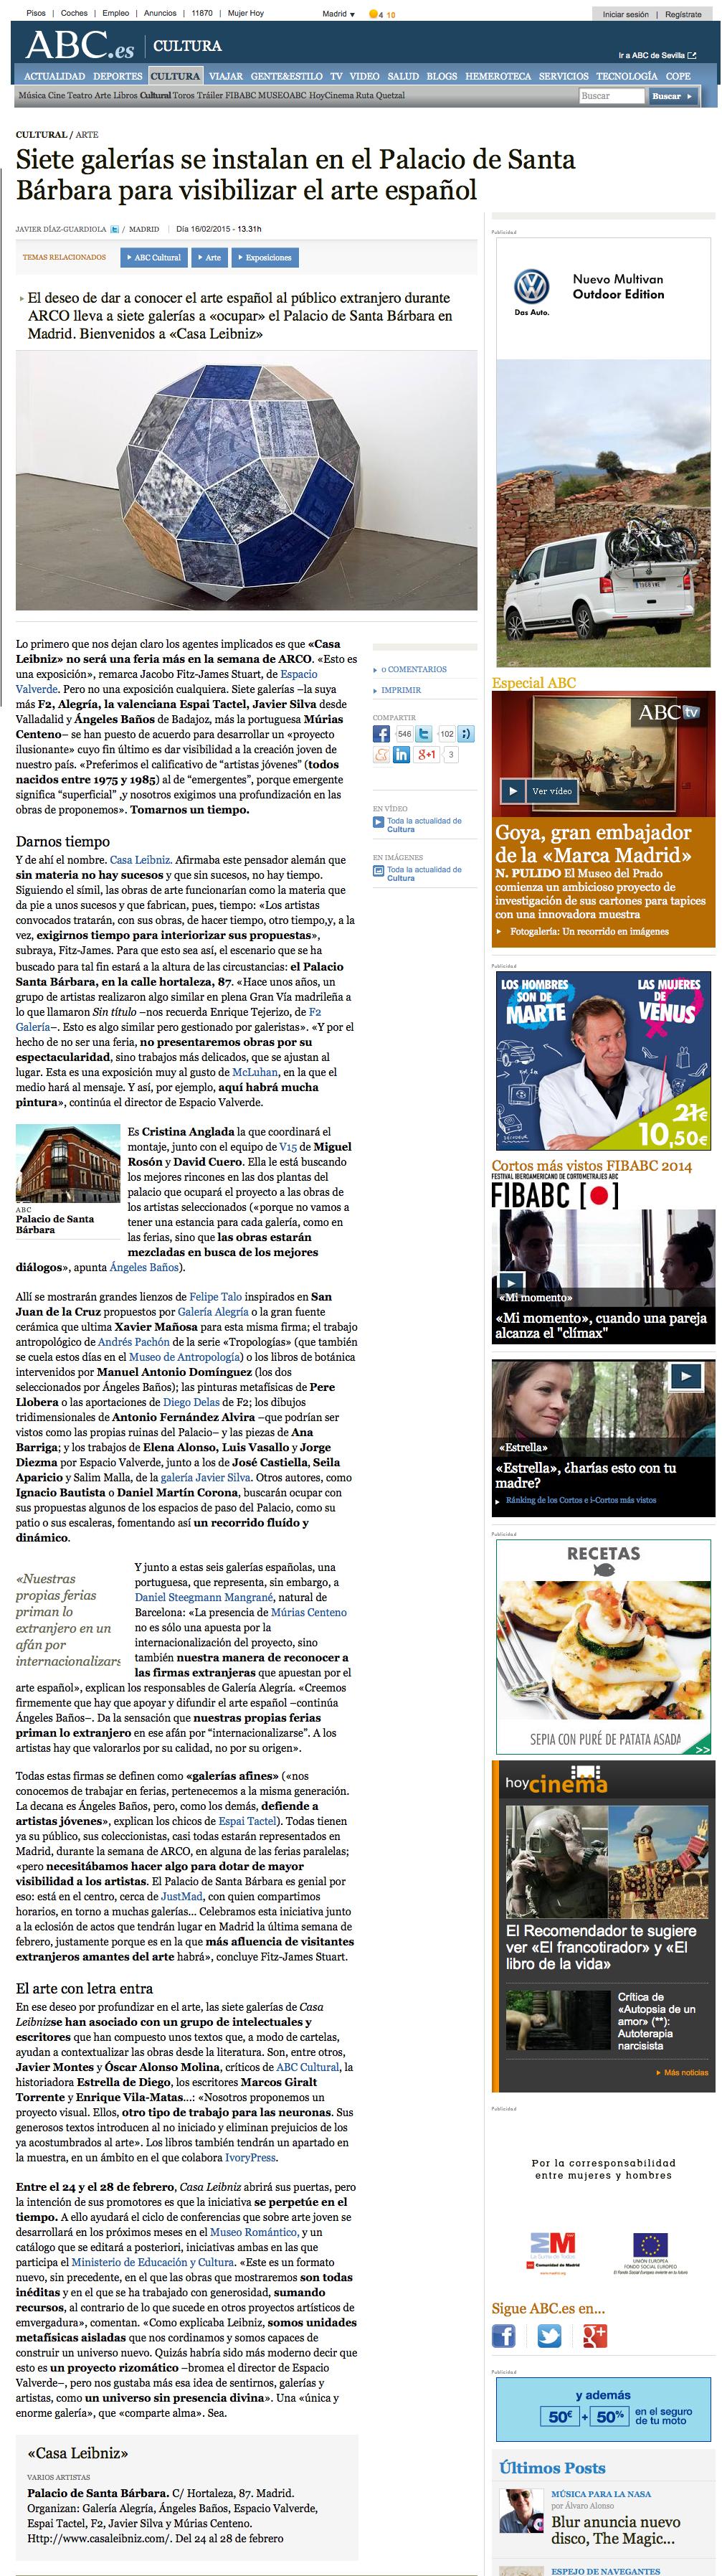 2015 ABC Casa leizmiz16-2-15